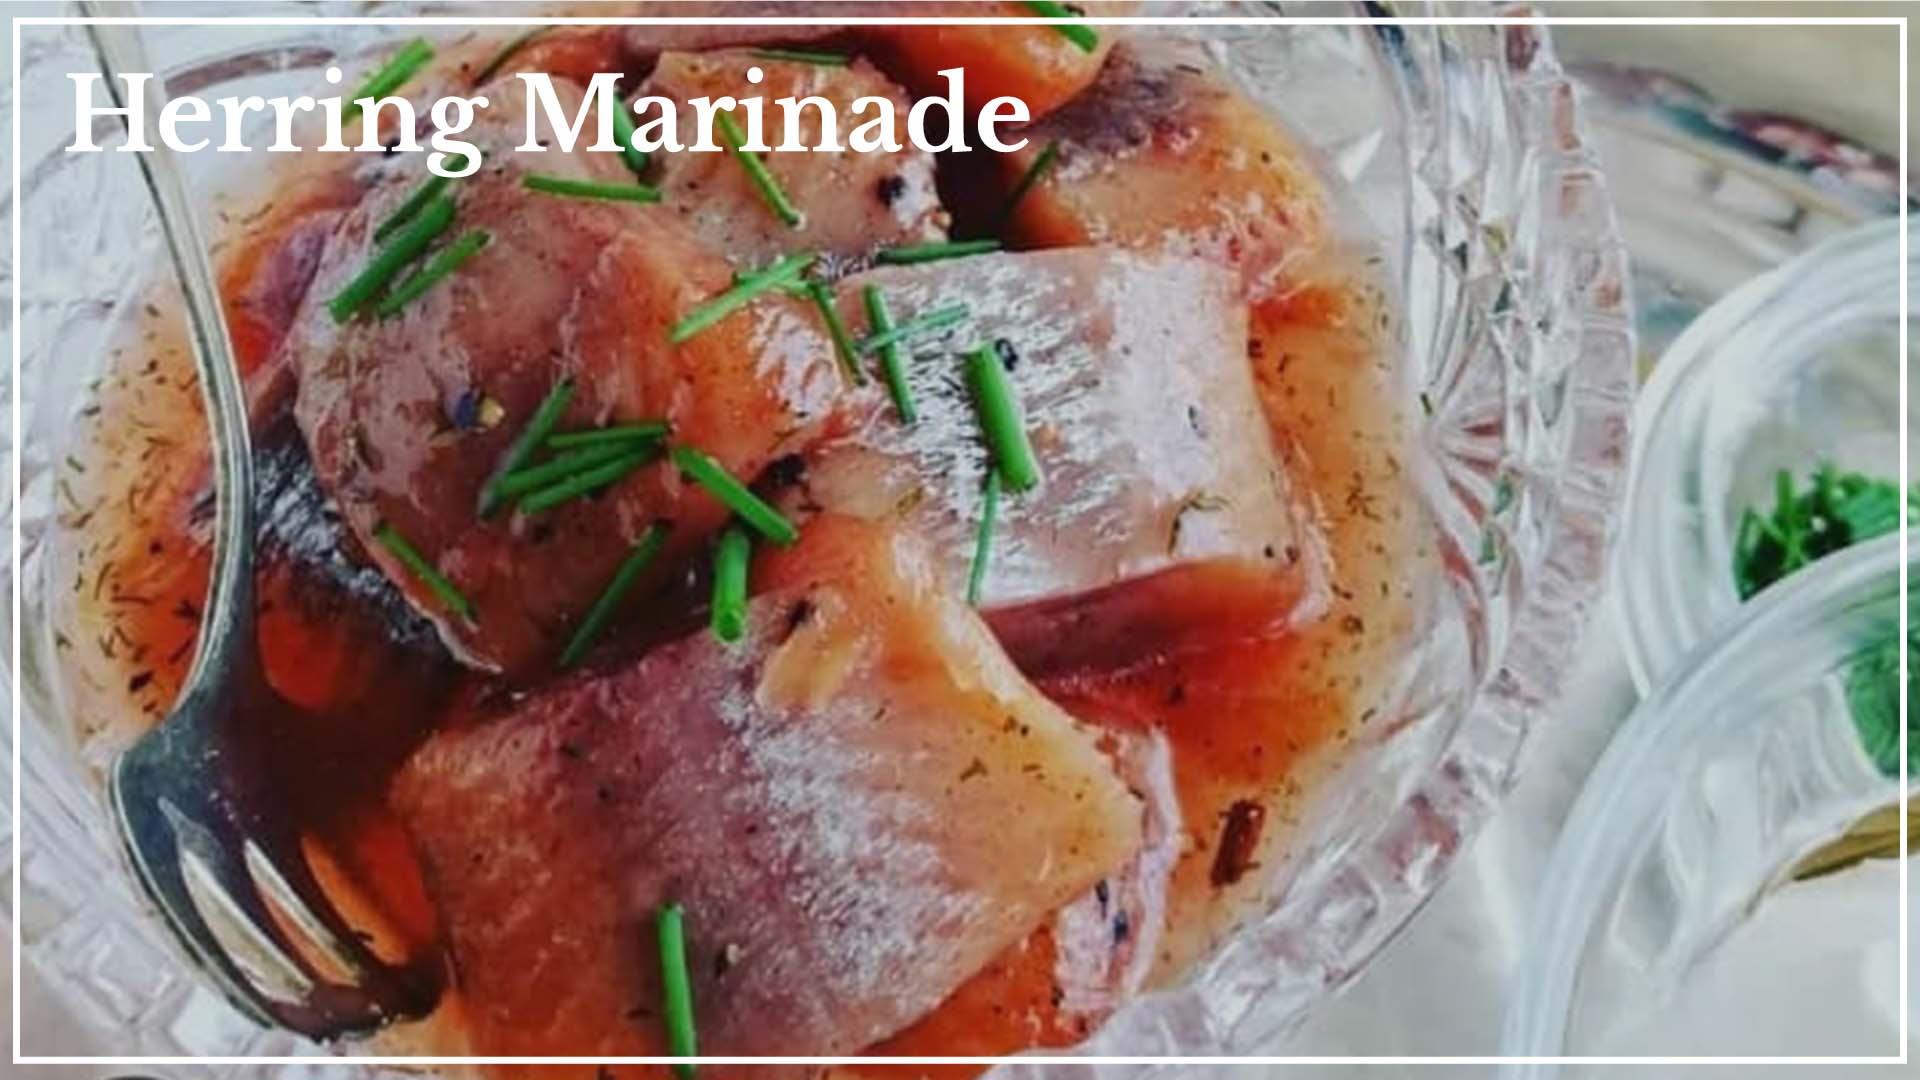 Herring Marinade